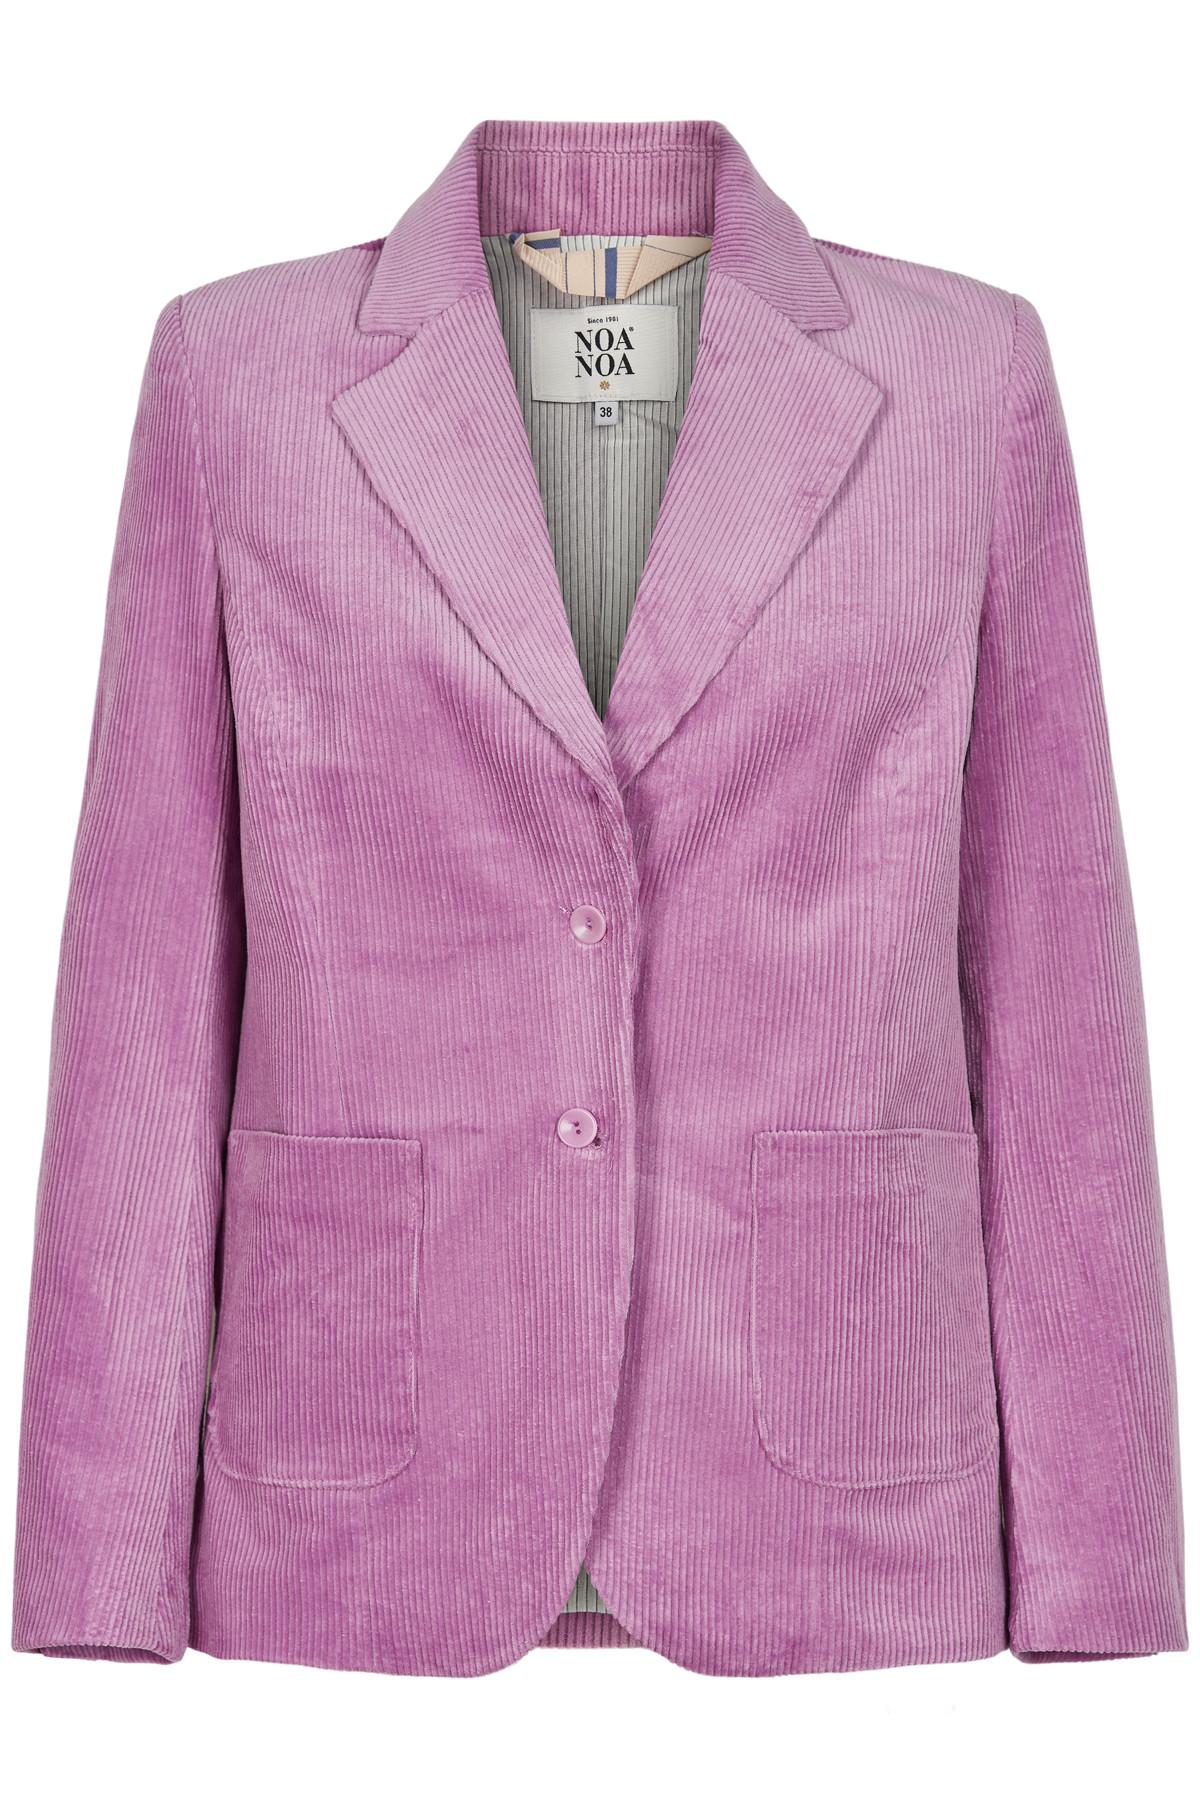 NOA NOA jakker 2020 • Gratis fragt i DK (0 kr.) |